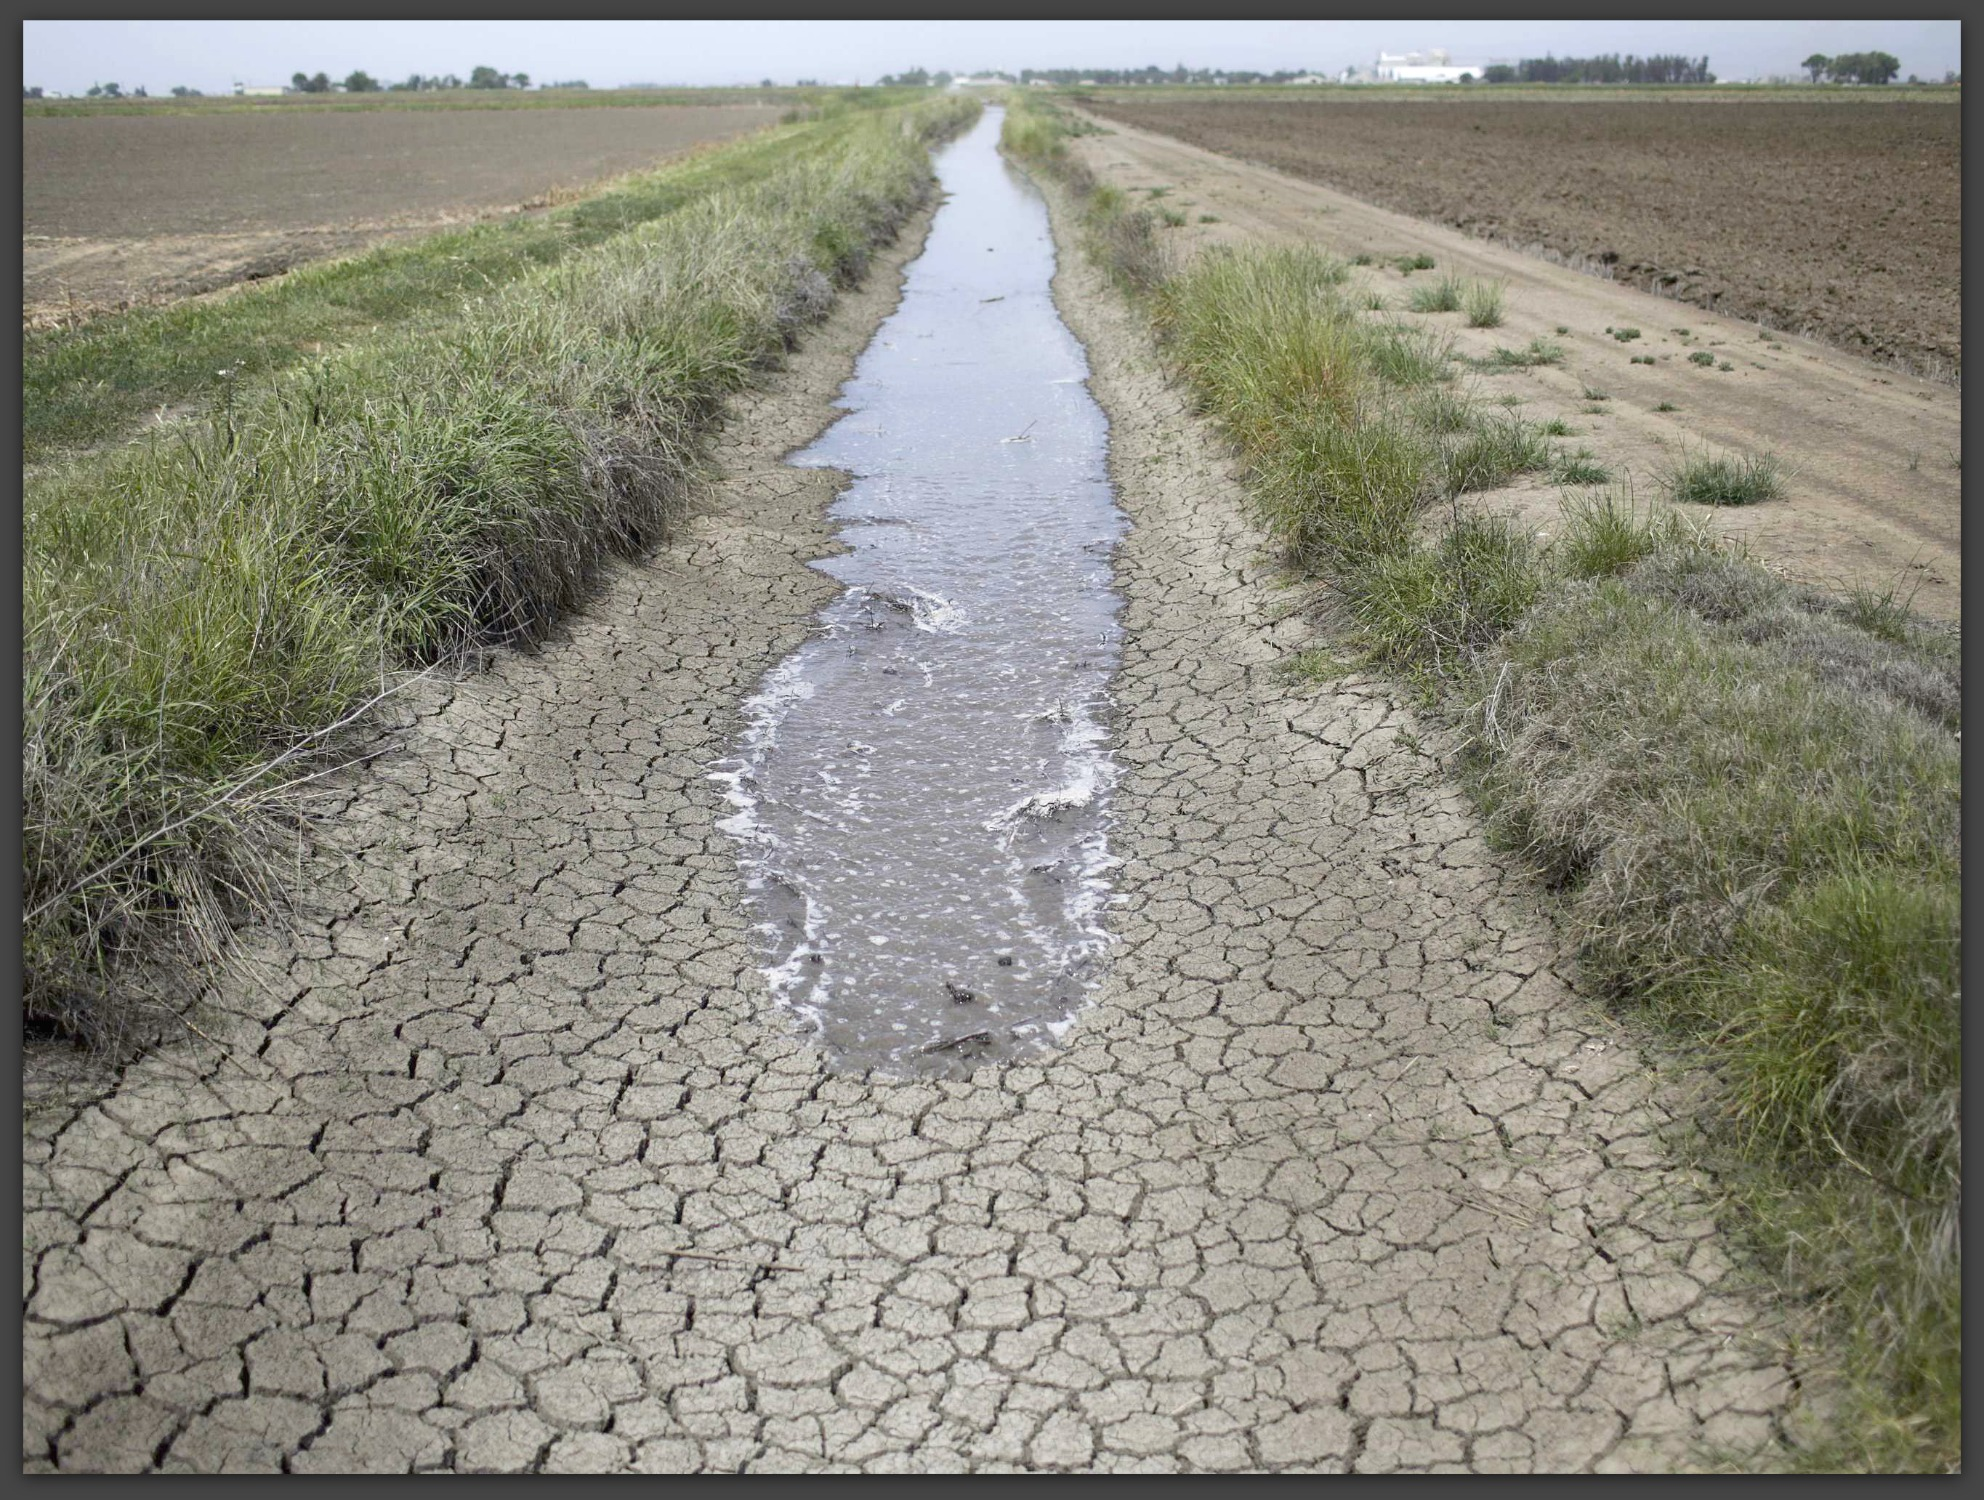 irrigation ditch, california. ap photo/jae c. hong